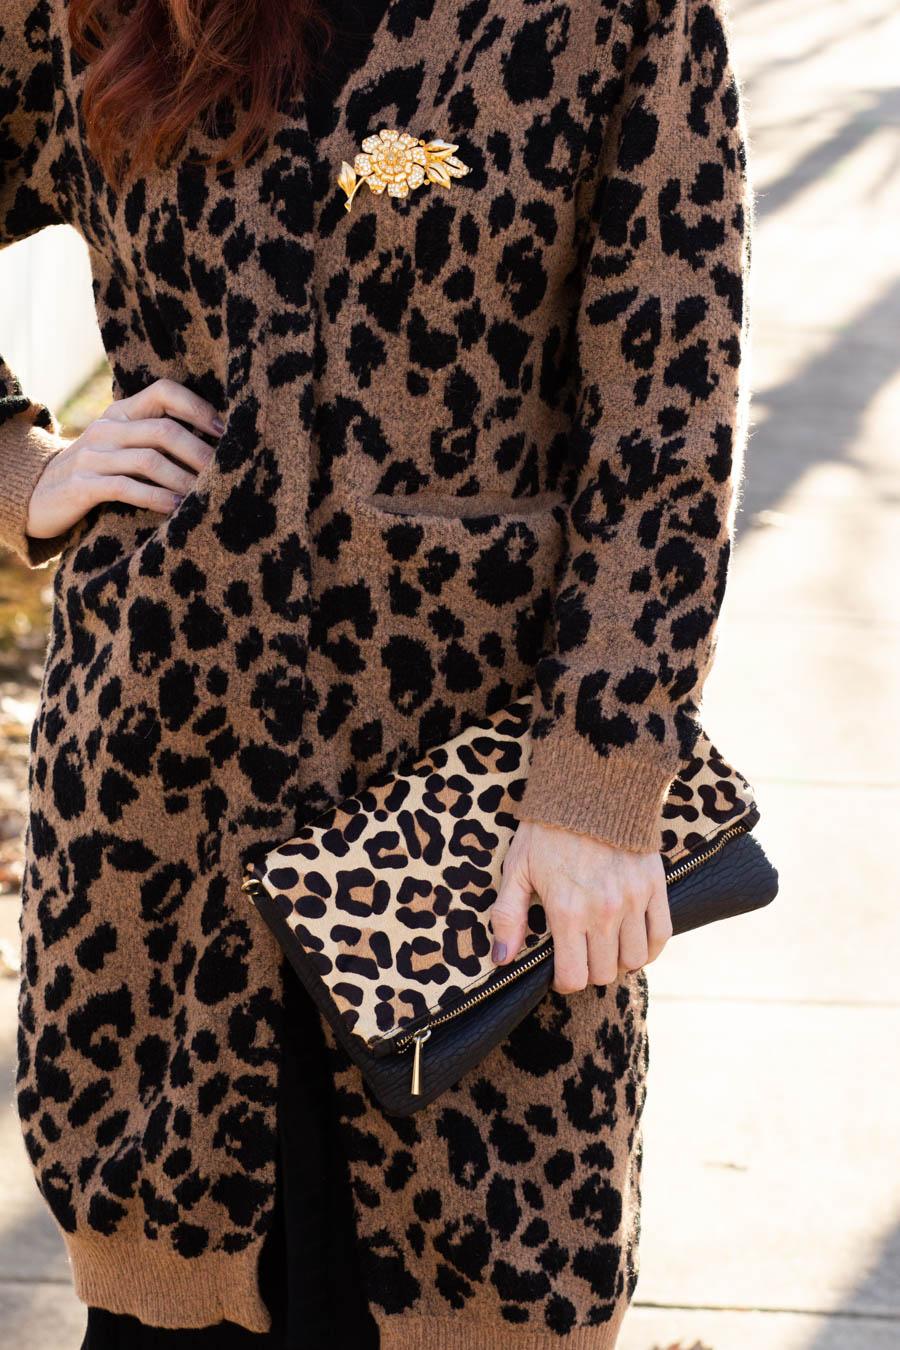 Leopard cardigan over dress